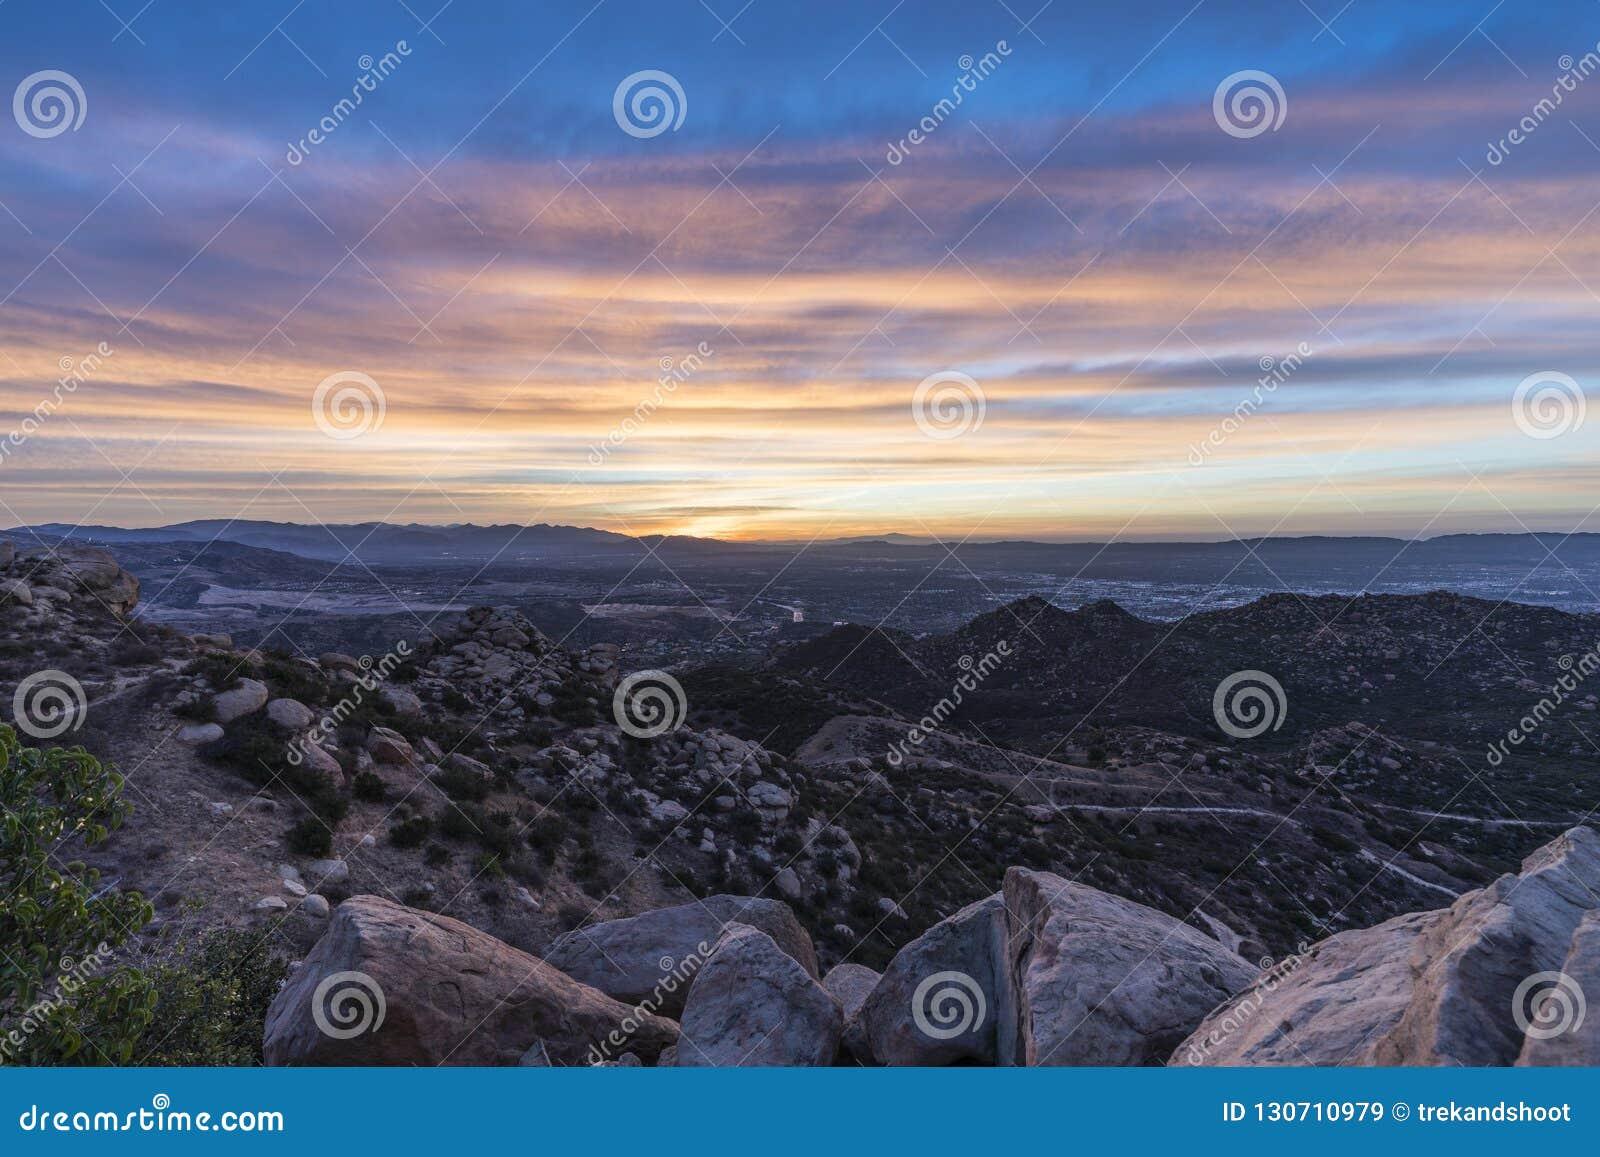 Los Angeles San Fernando Valley Rocky Hillside Sunrise Stock Image